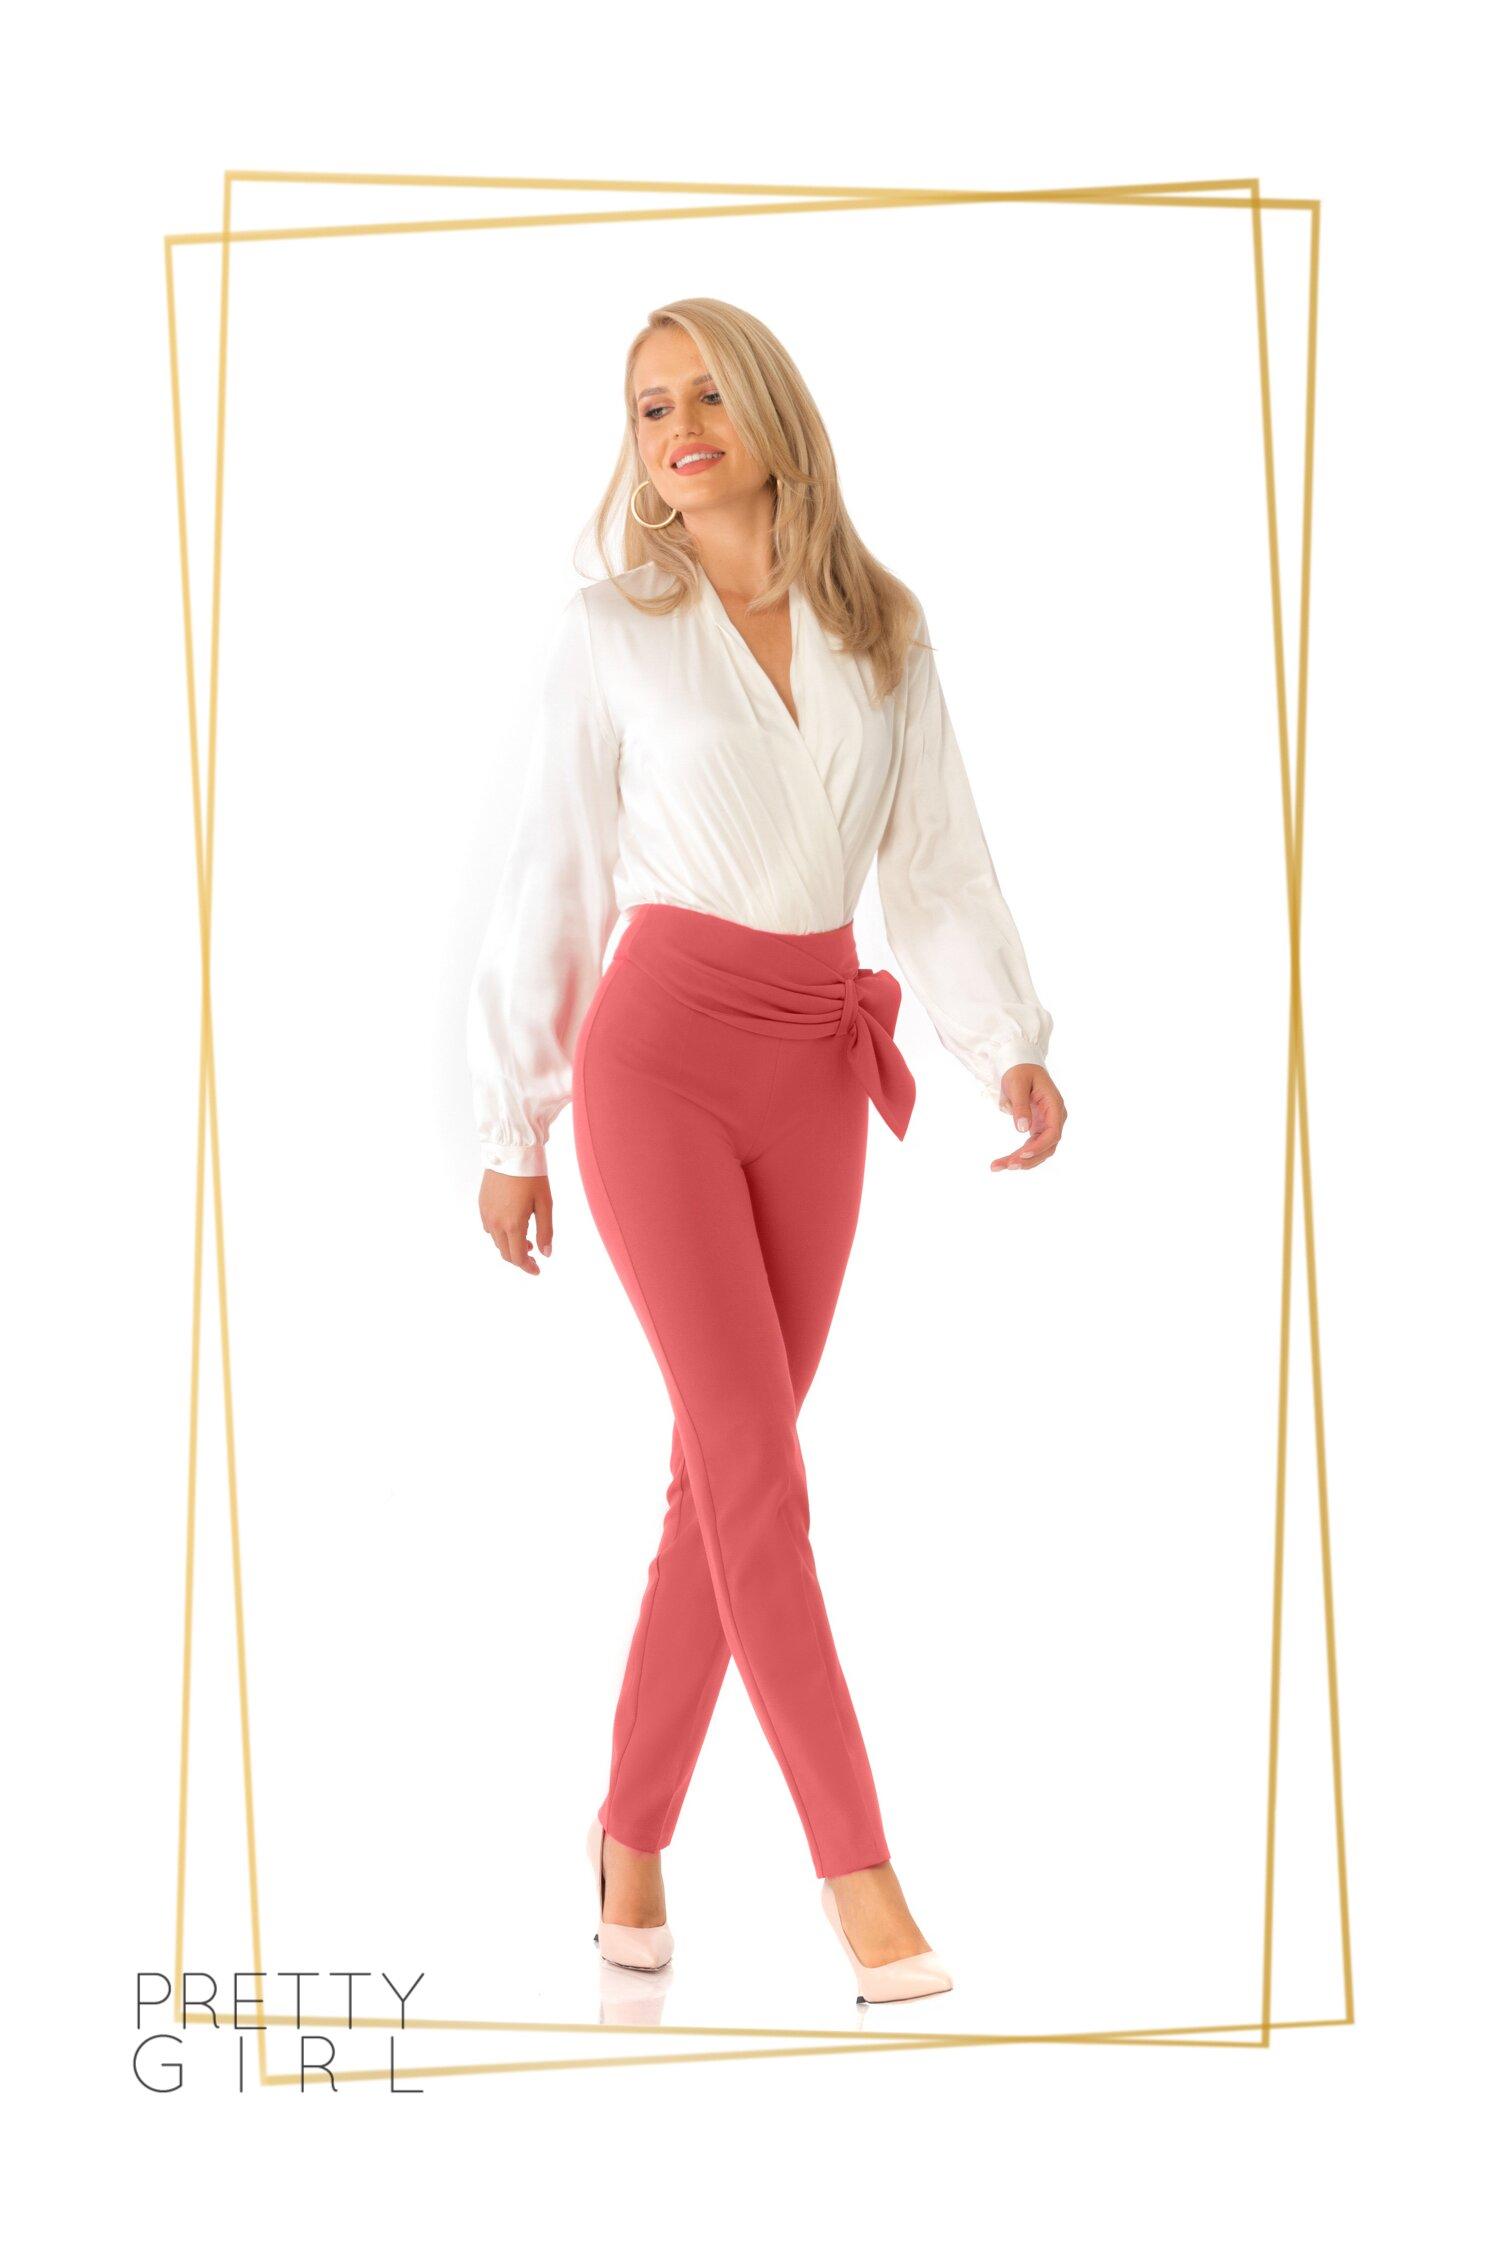 Camasa Pretty Girl ivoire tip body cu decolteul adanc in forma de V